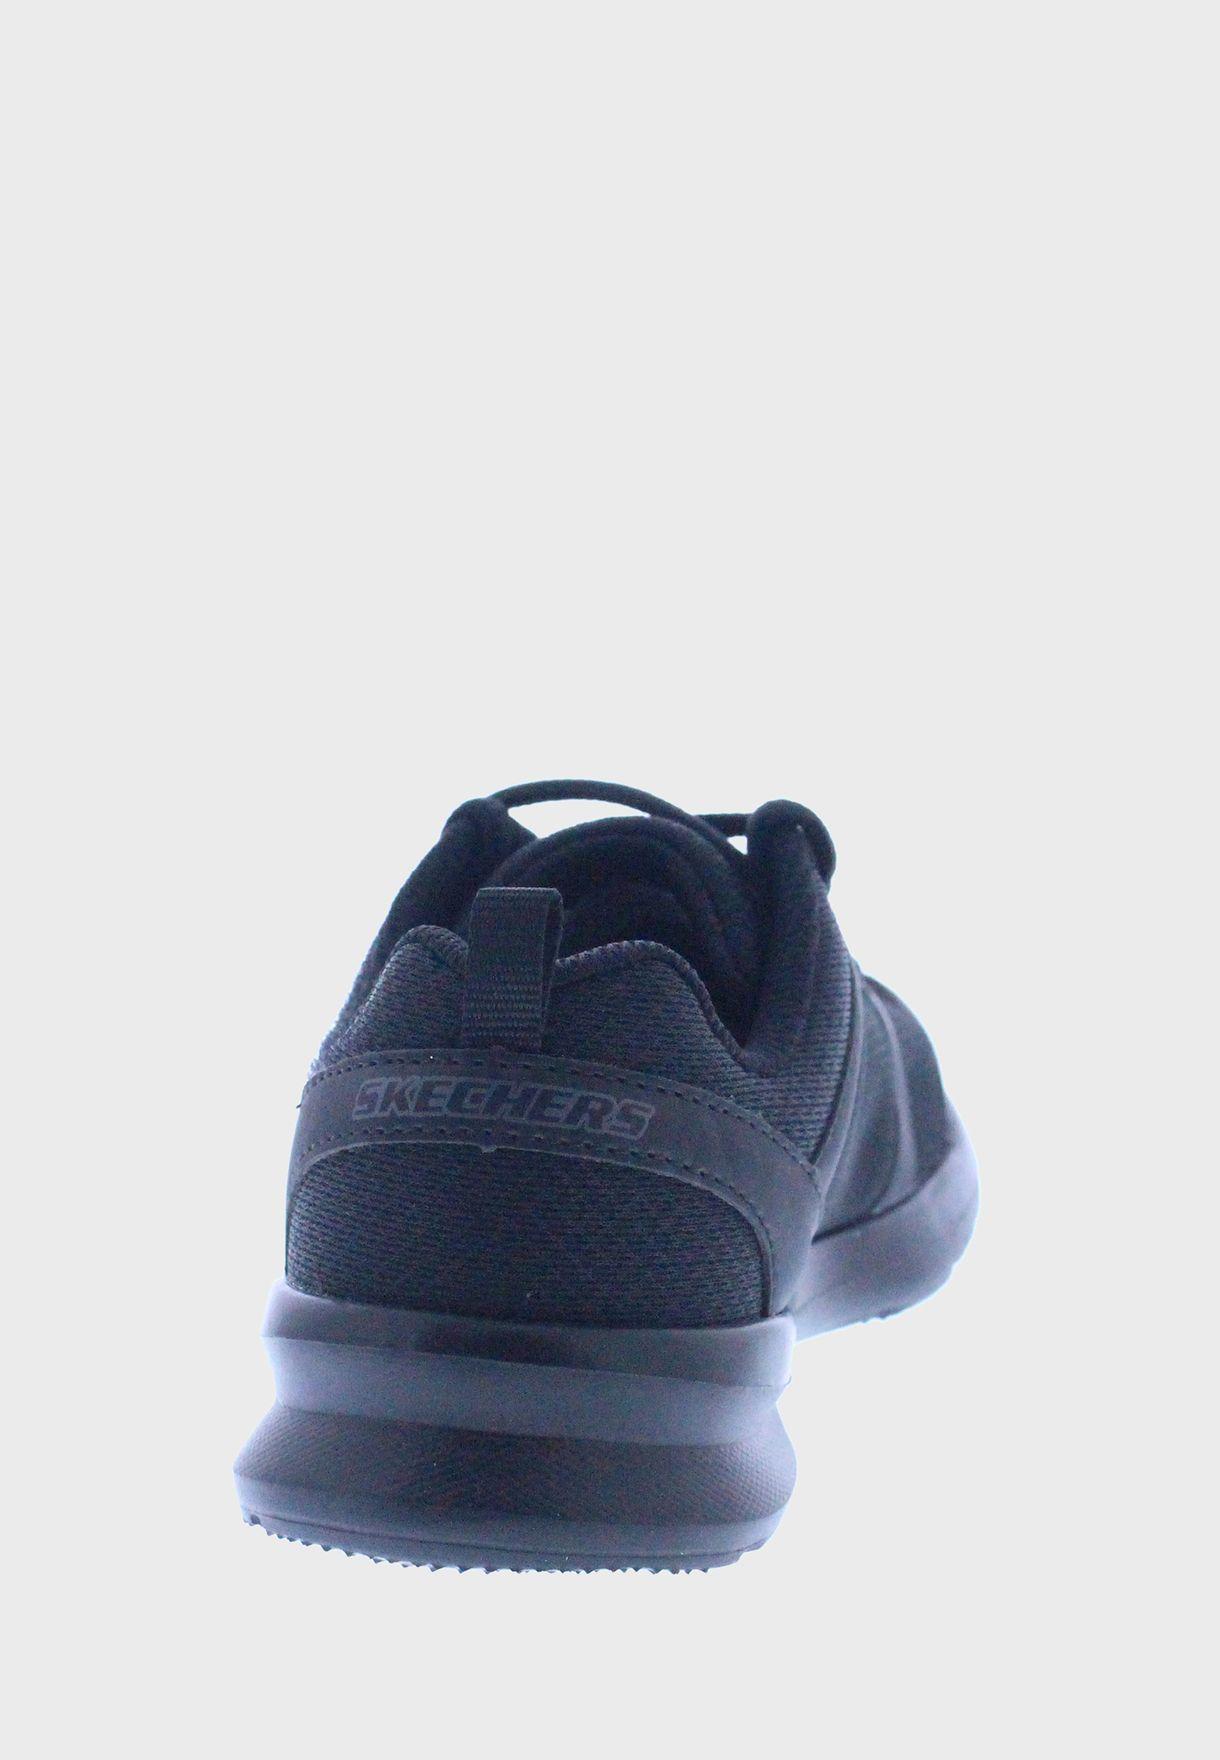 حذاء ستيبز -سبيد-دايل